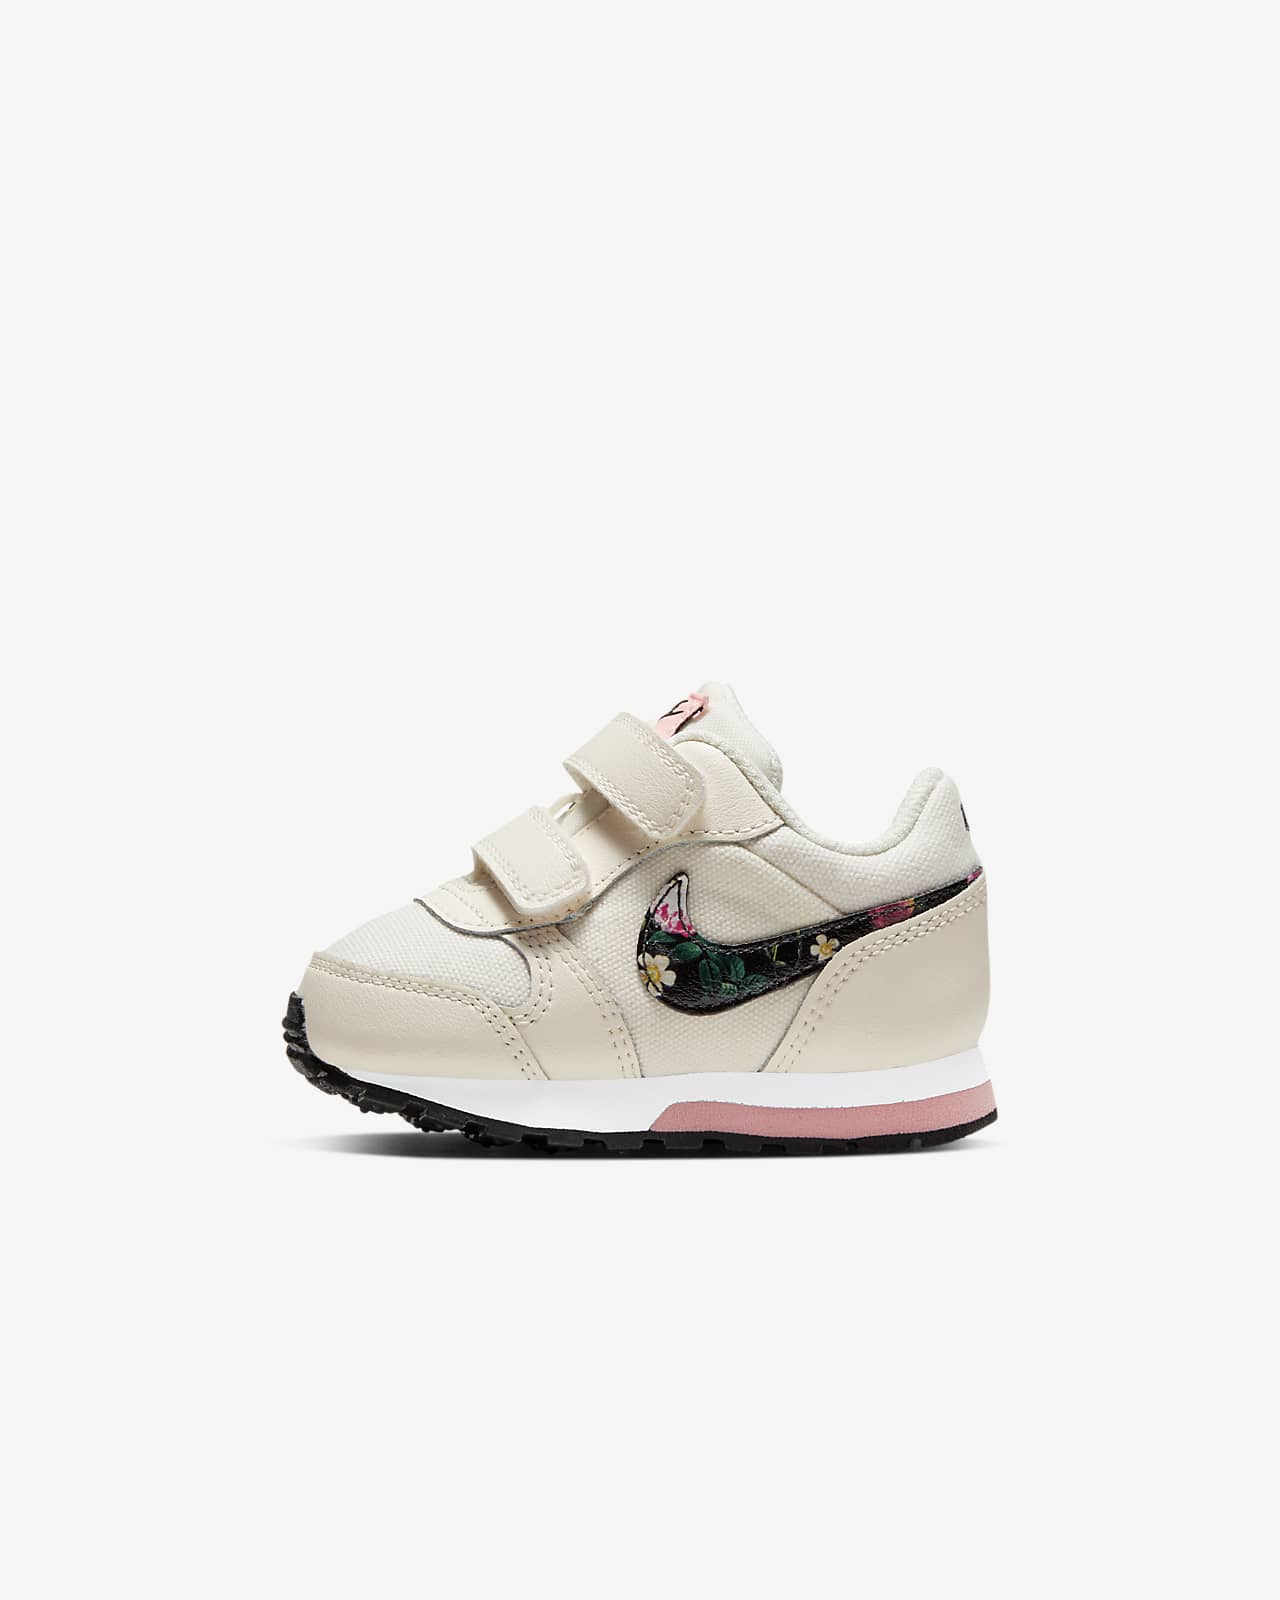 Nike MD Runner 2 Vintage Floral Baby and Toddler Shoe